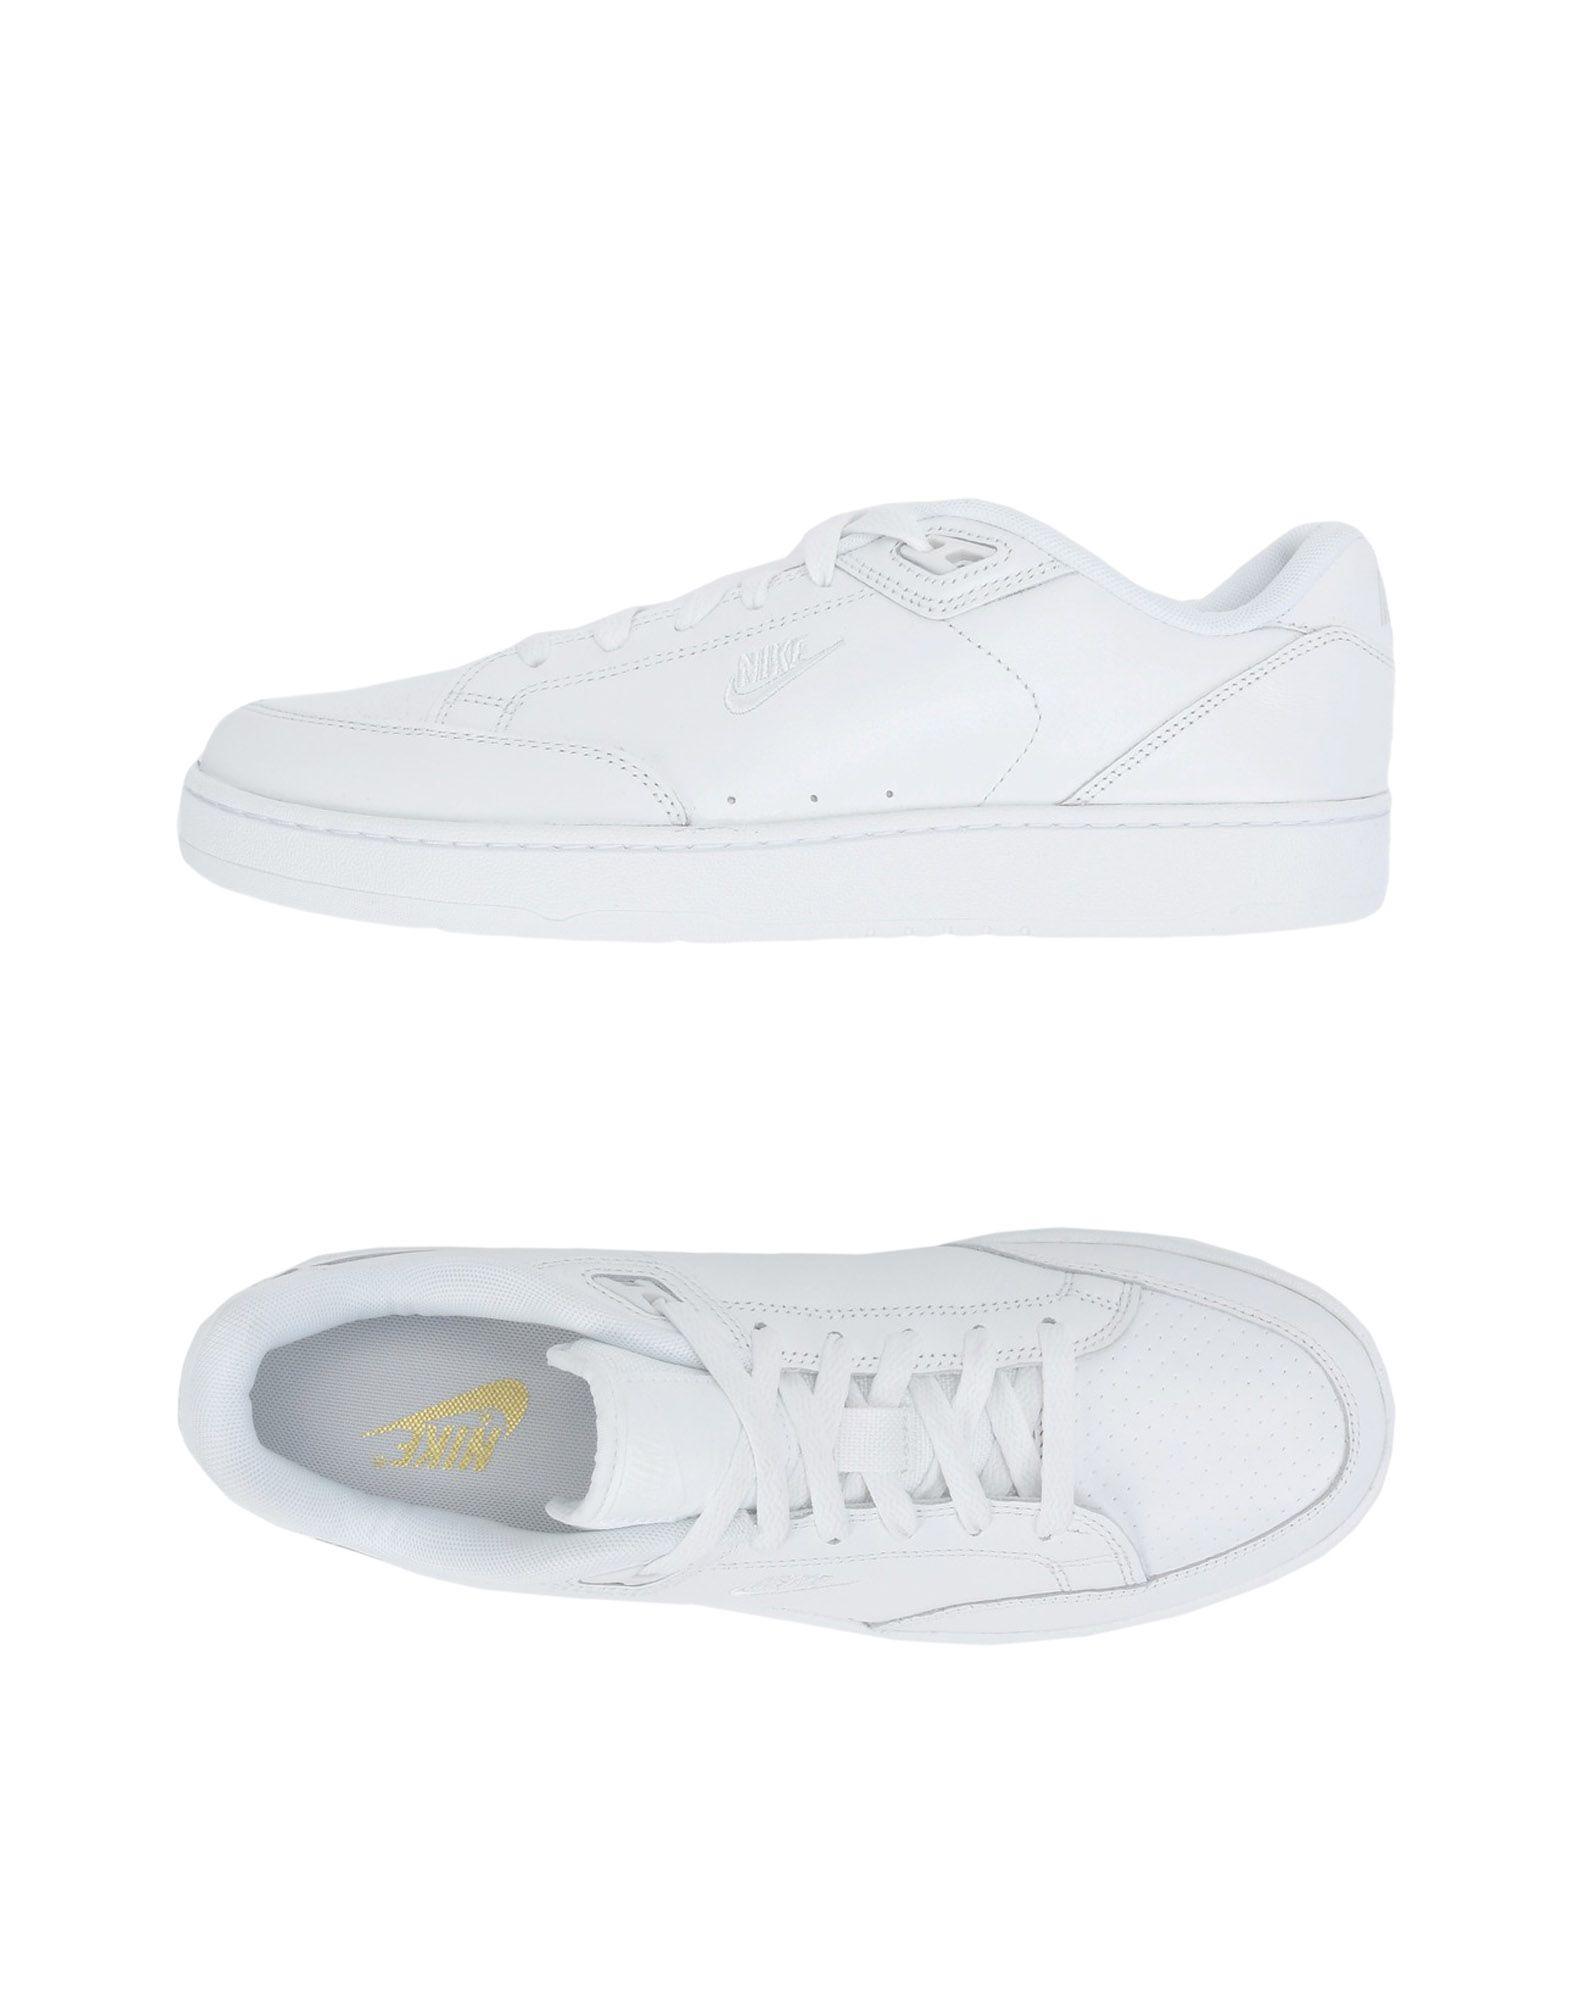 Sneakers Nike Grandstand Ii Premium - Uomo - 11489603GD